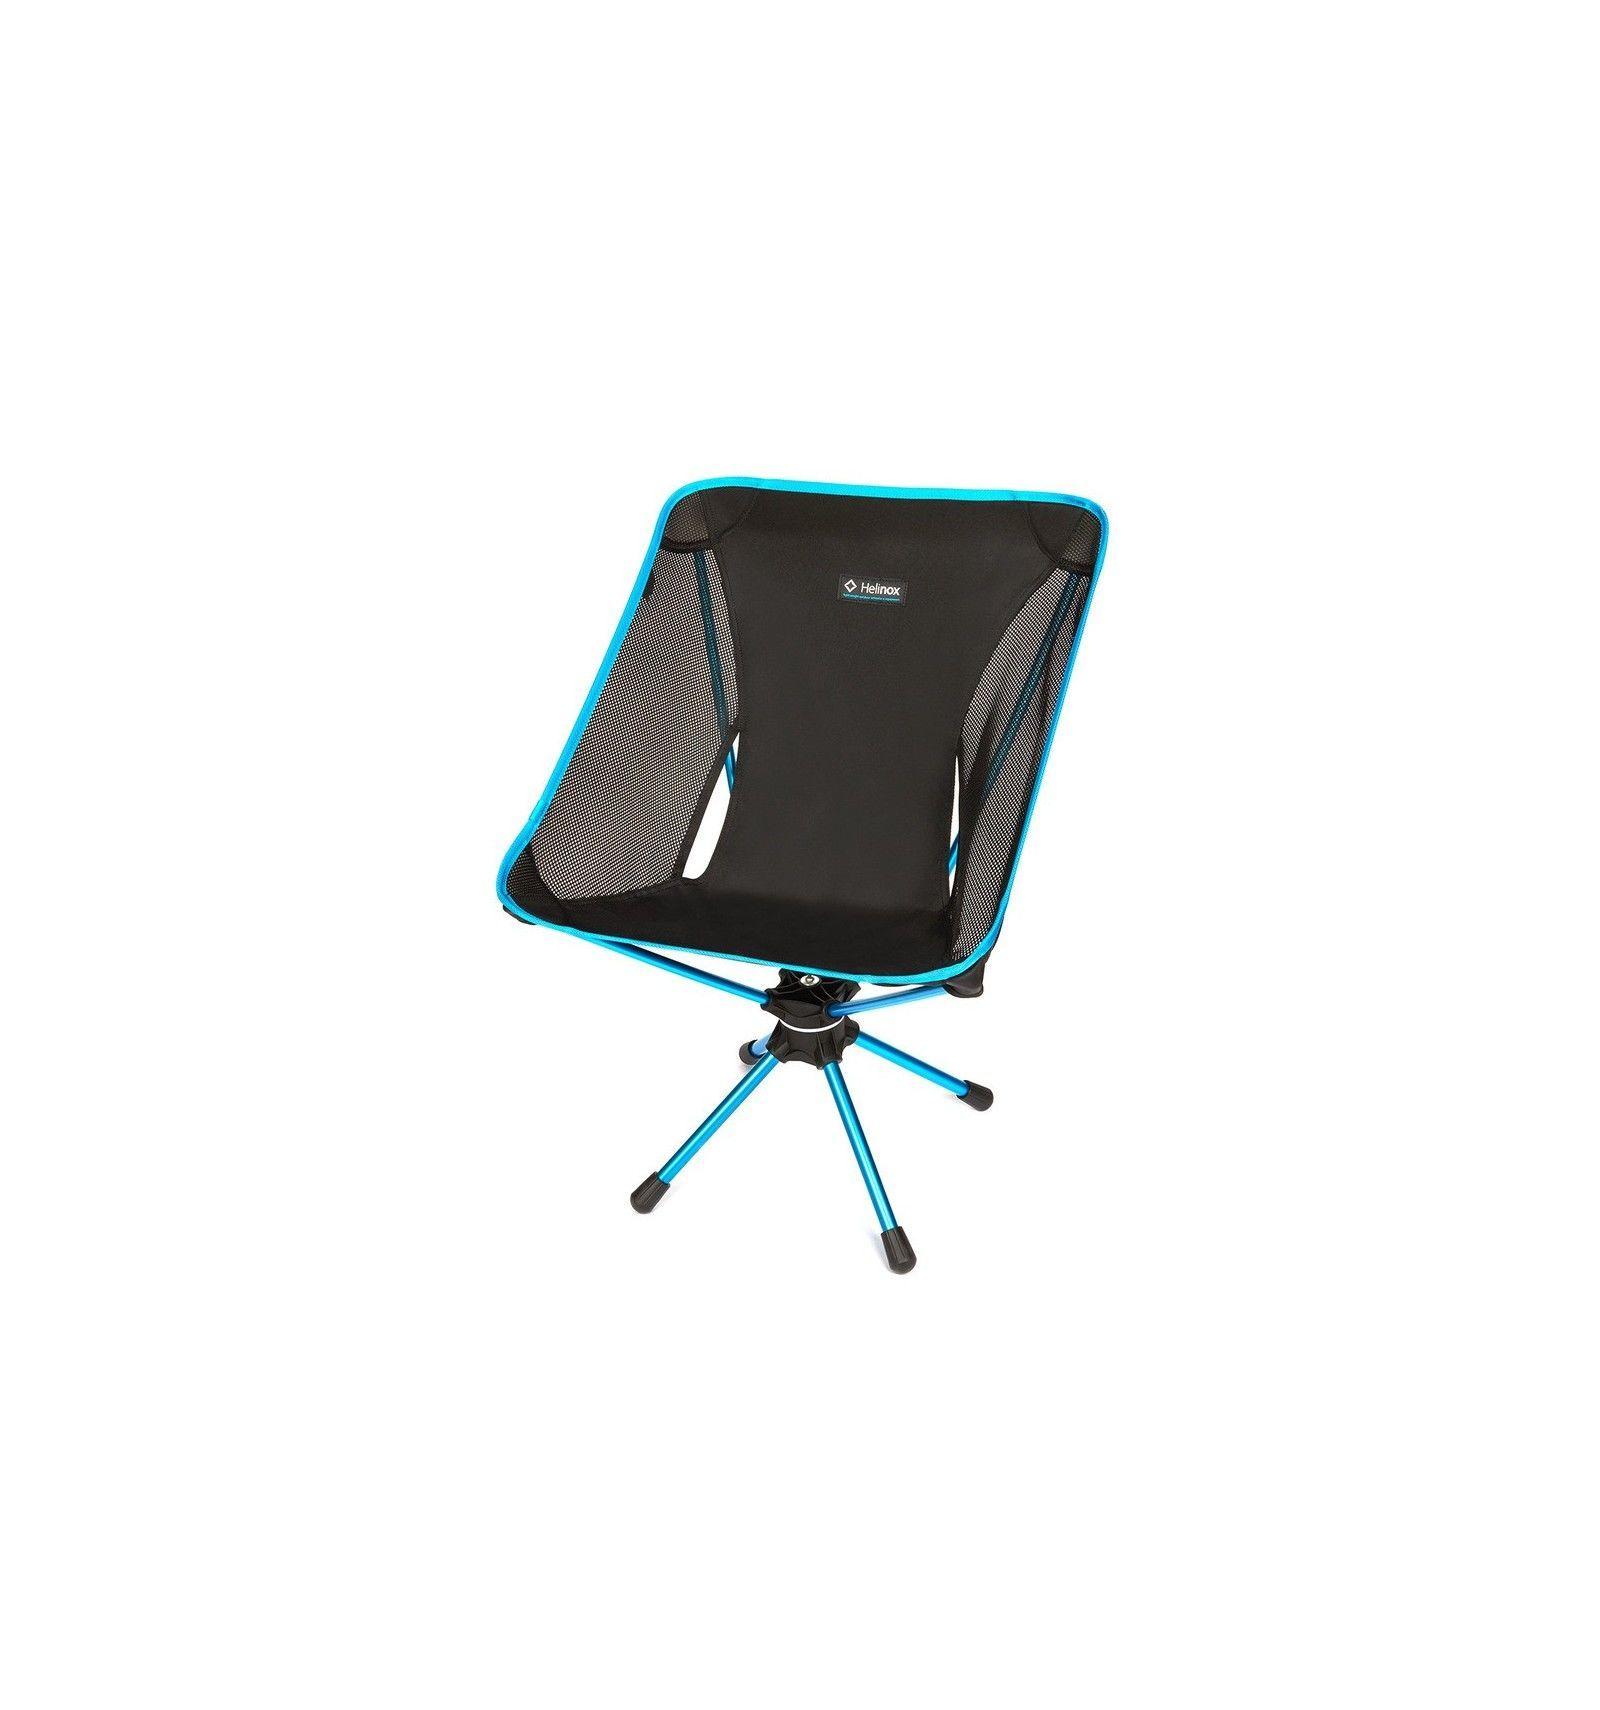 Admirable Helinox Swivel Chair Machost Co Dining Chair Design Ideas Machostcouk